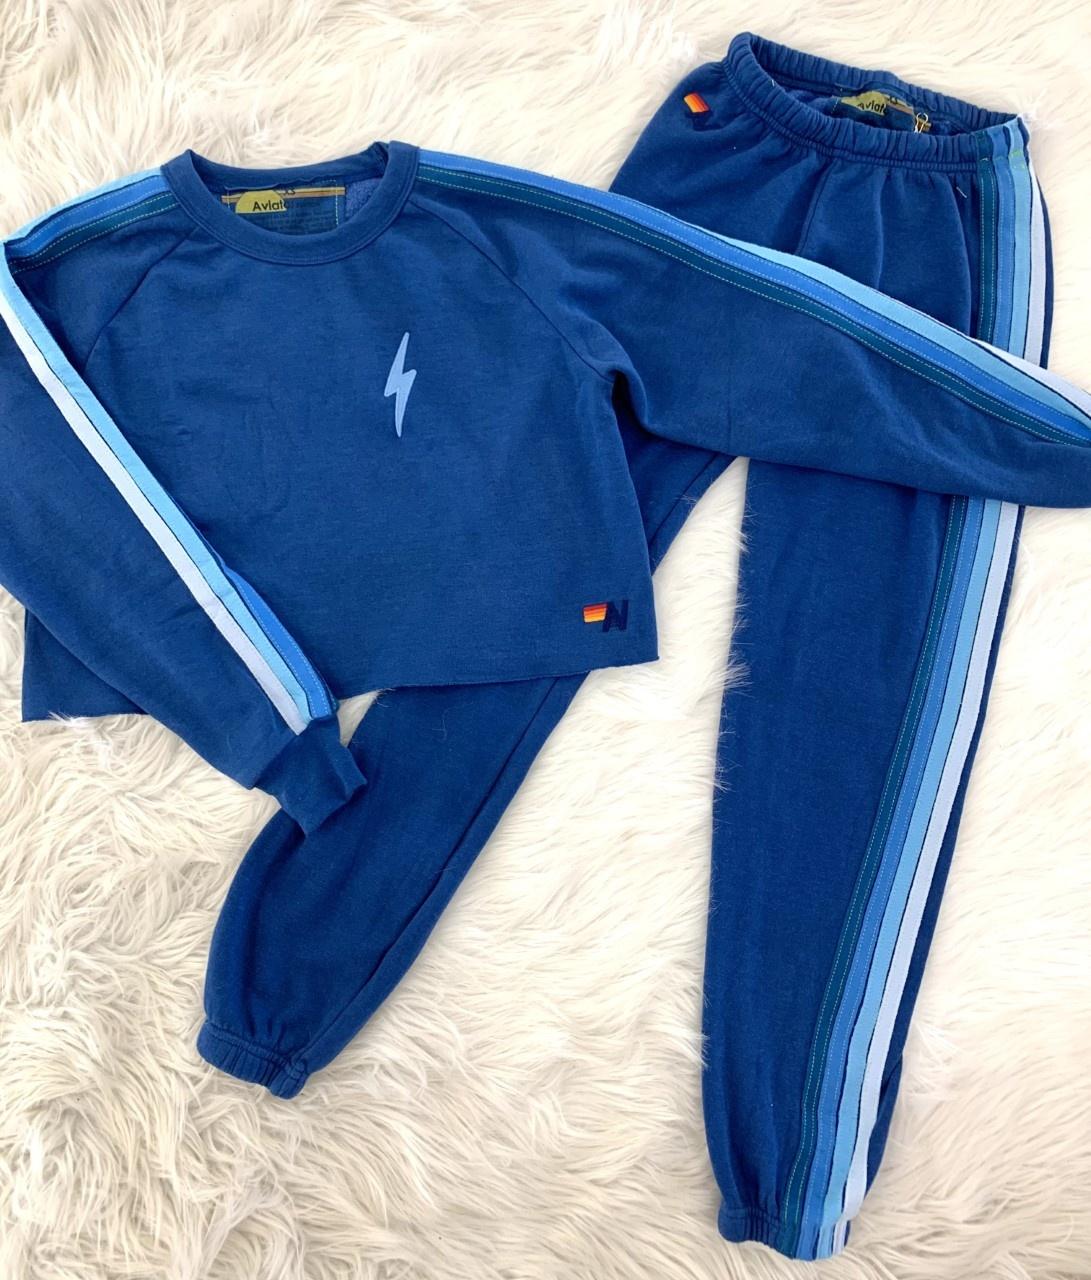 Aviator Nation 4 Stripe Womens Sweatpant Royal/Light Blue